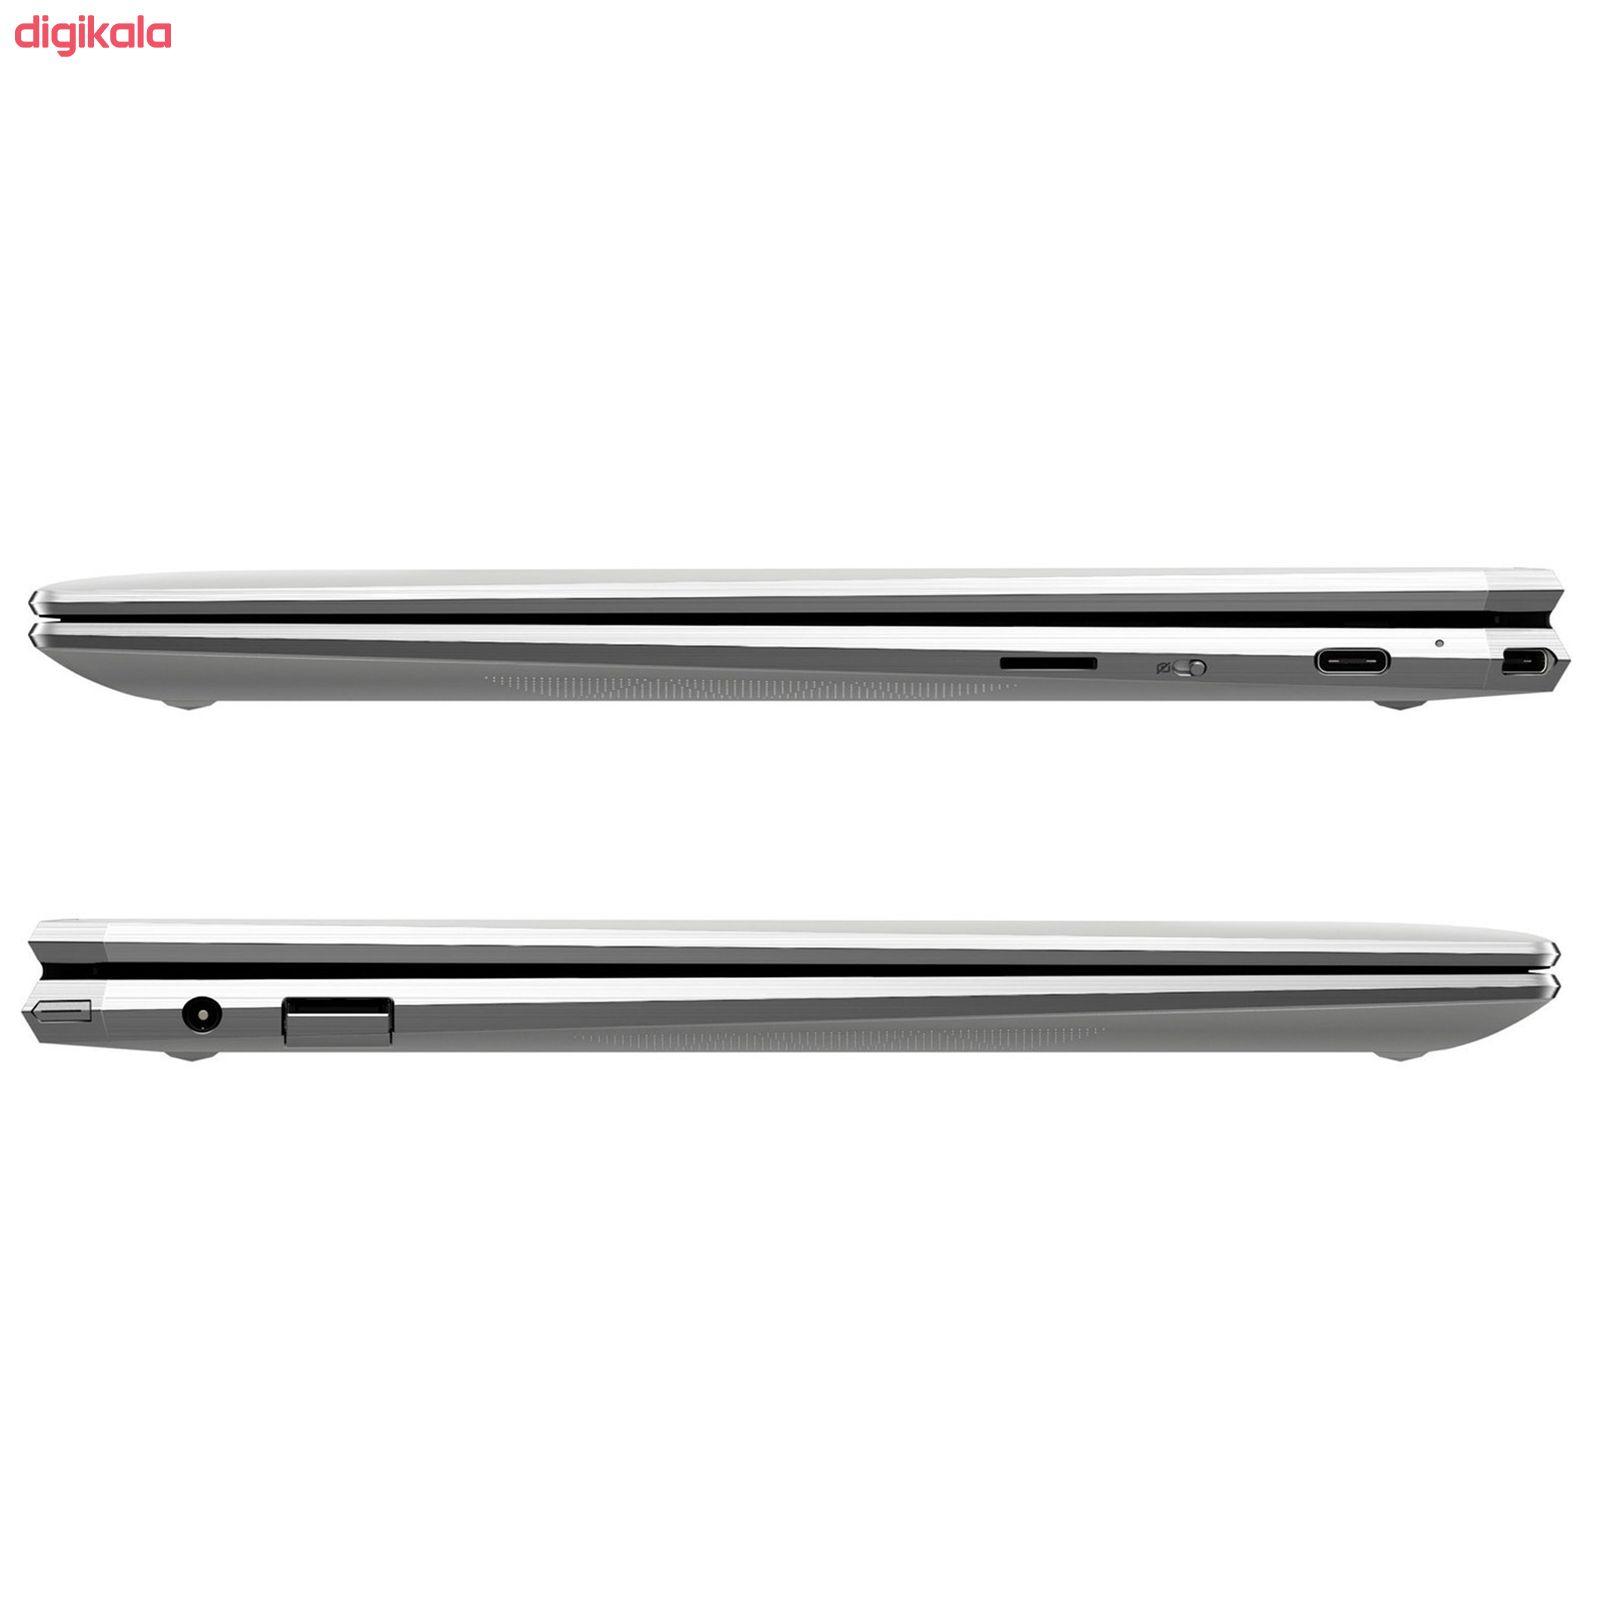 لپ تاپ 13.3 اینچی اچپی مدل Spectre 13t AW200-A